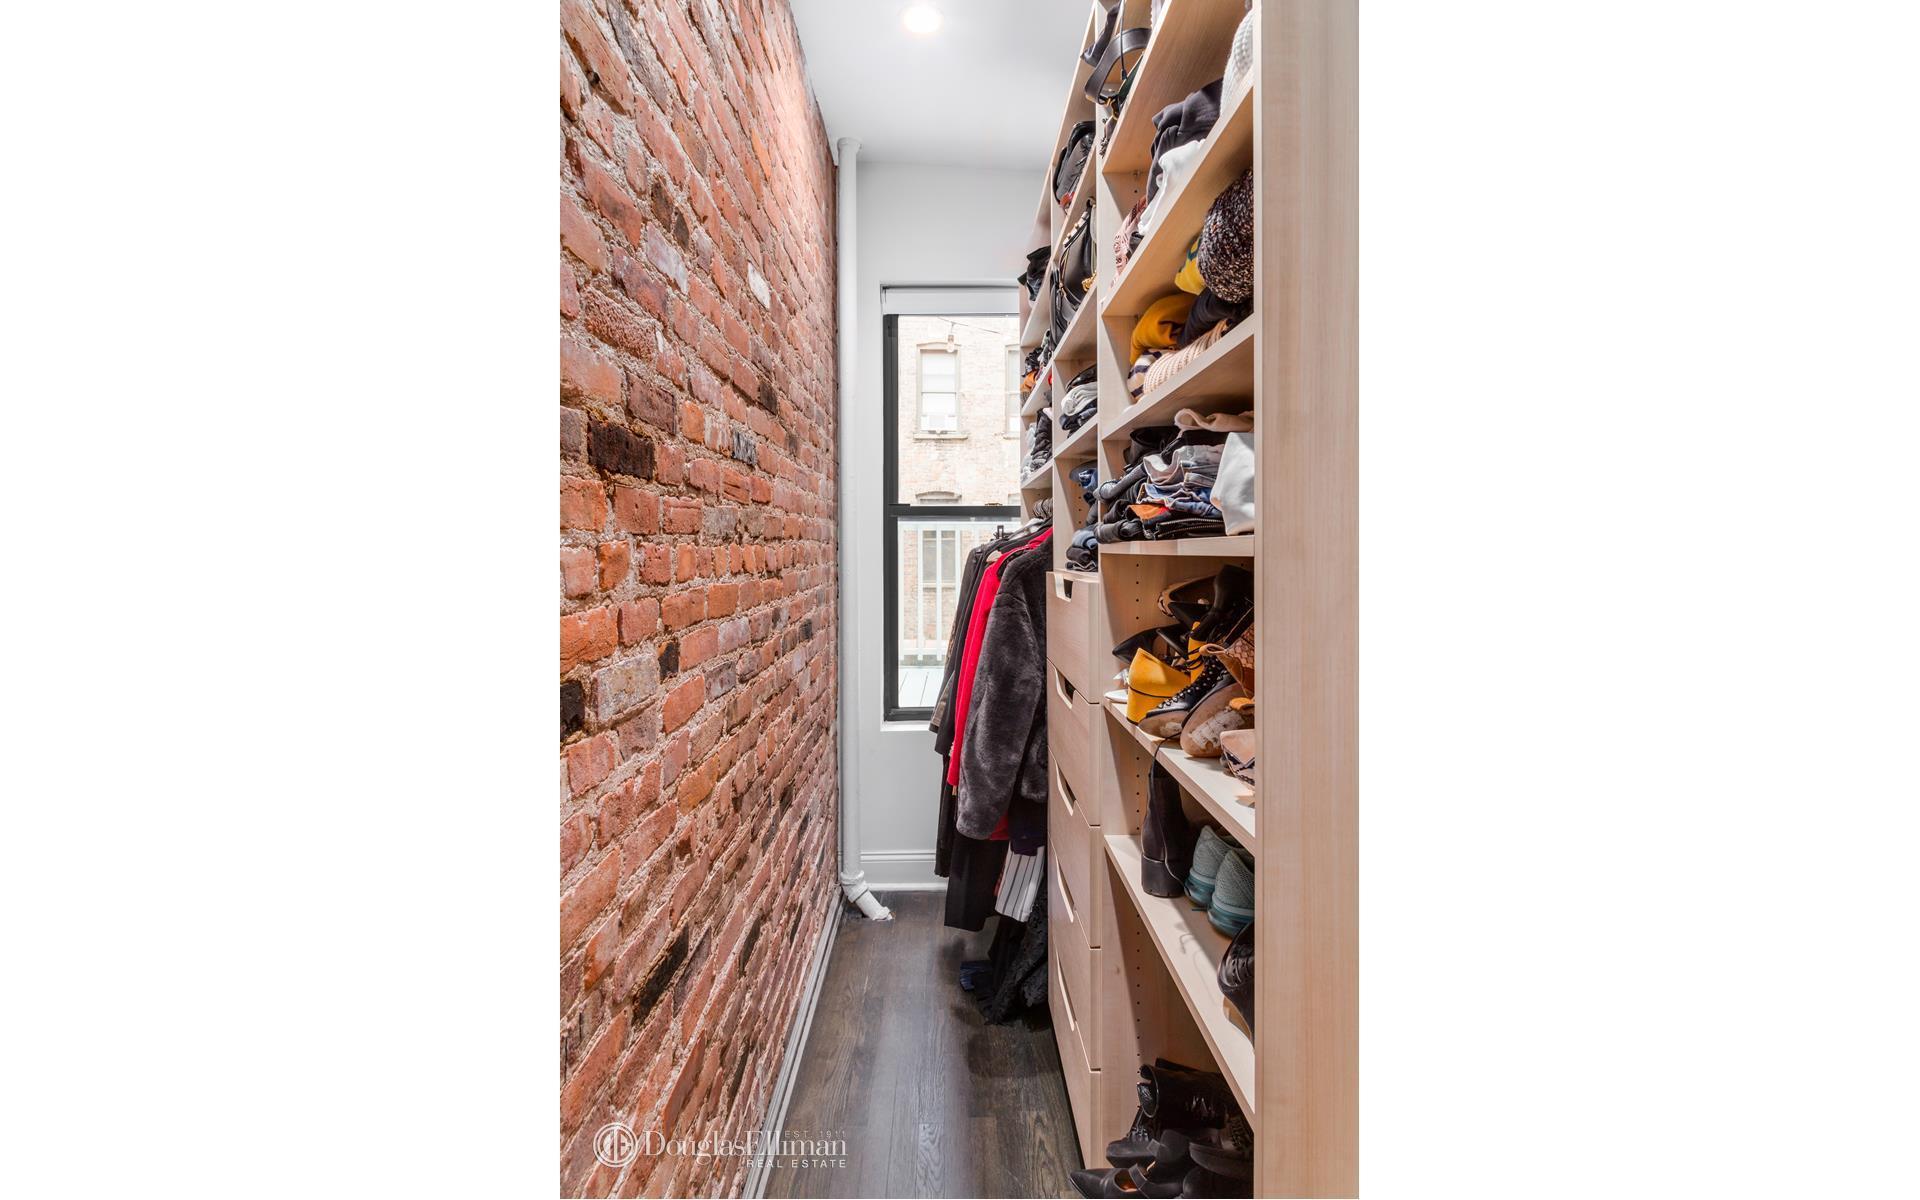 Diane Kruger Buys New York Condo Bedroom Closet